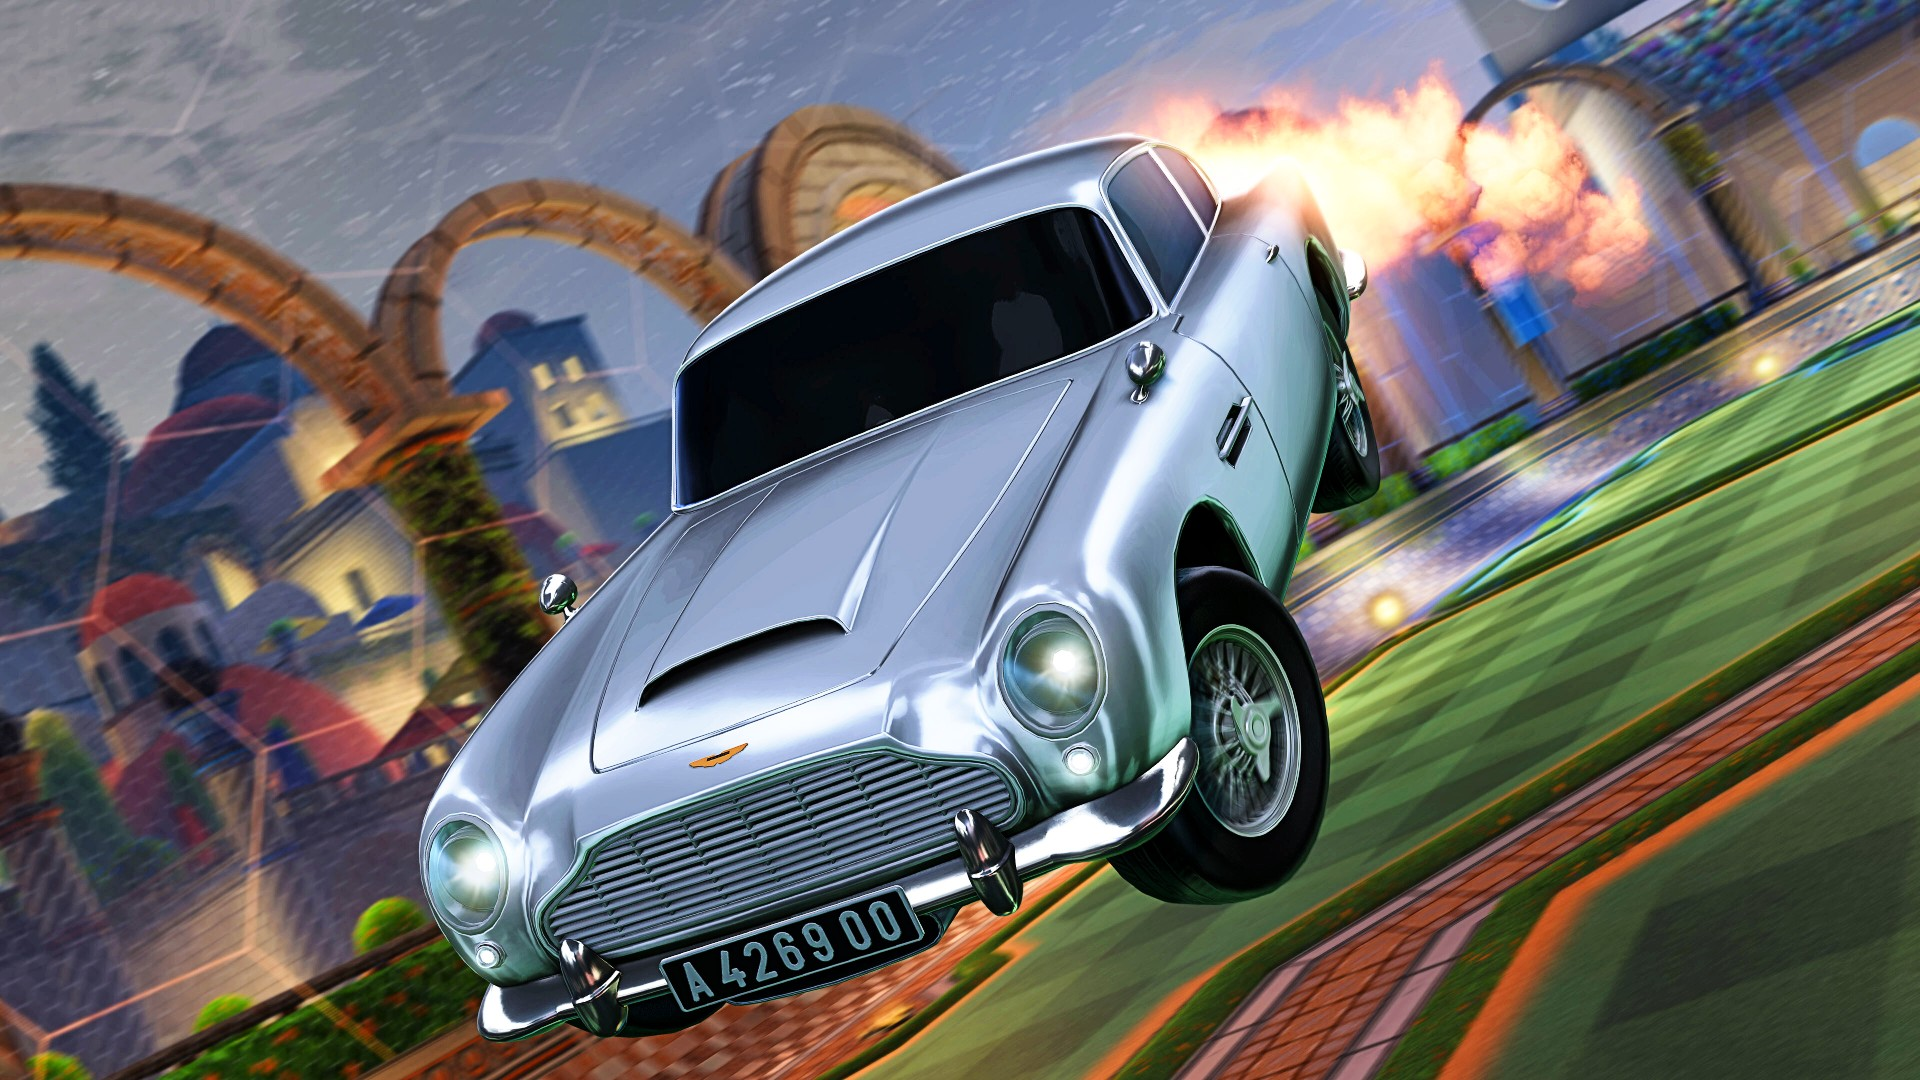 Rocket League is getting James Bond's Aston Martin